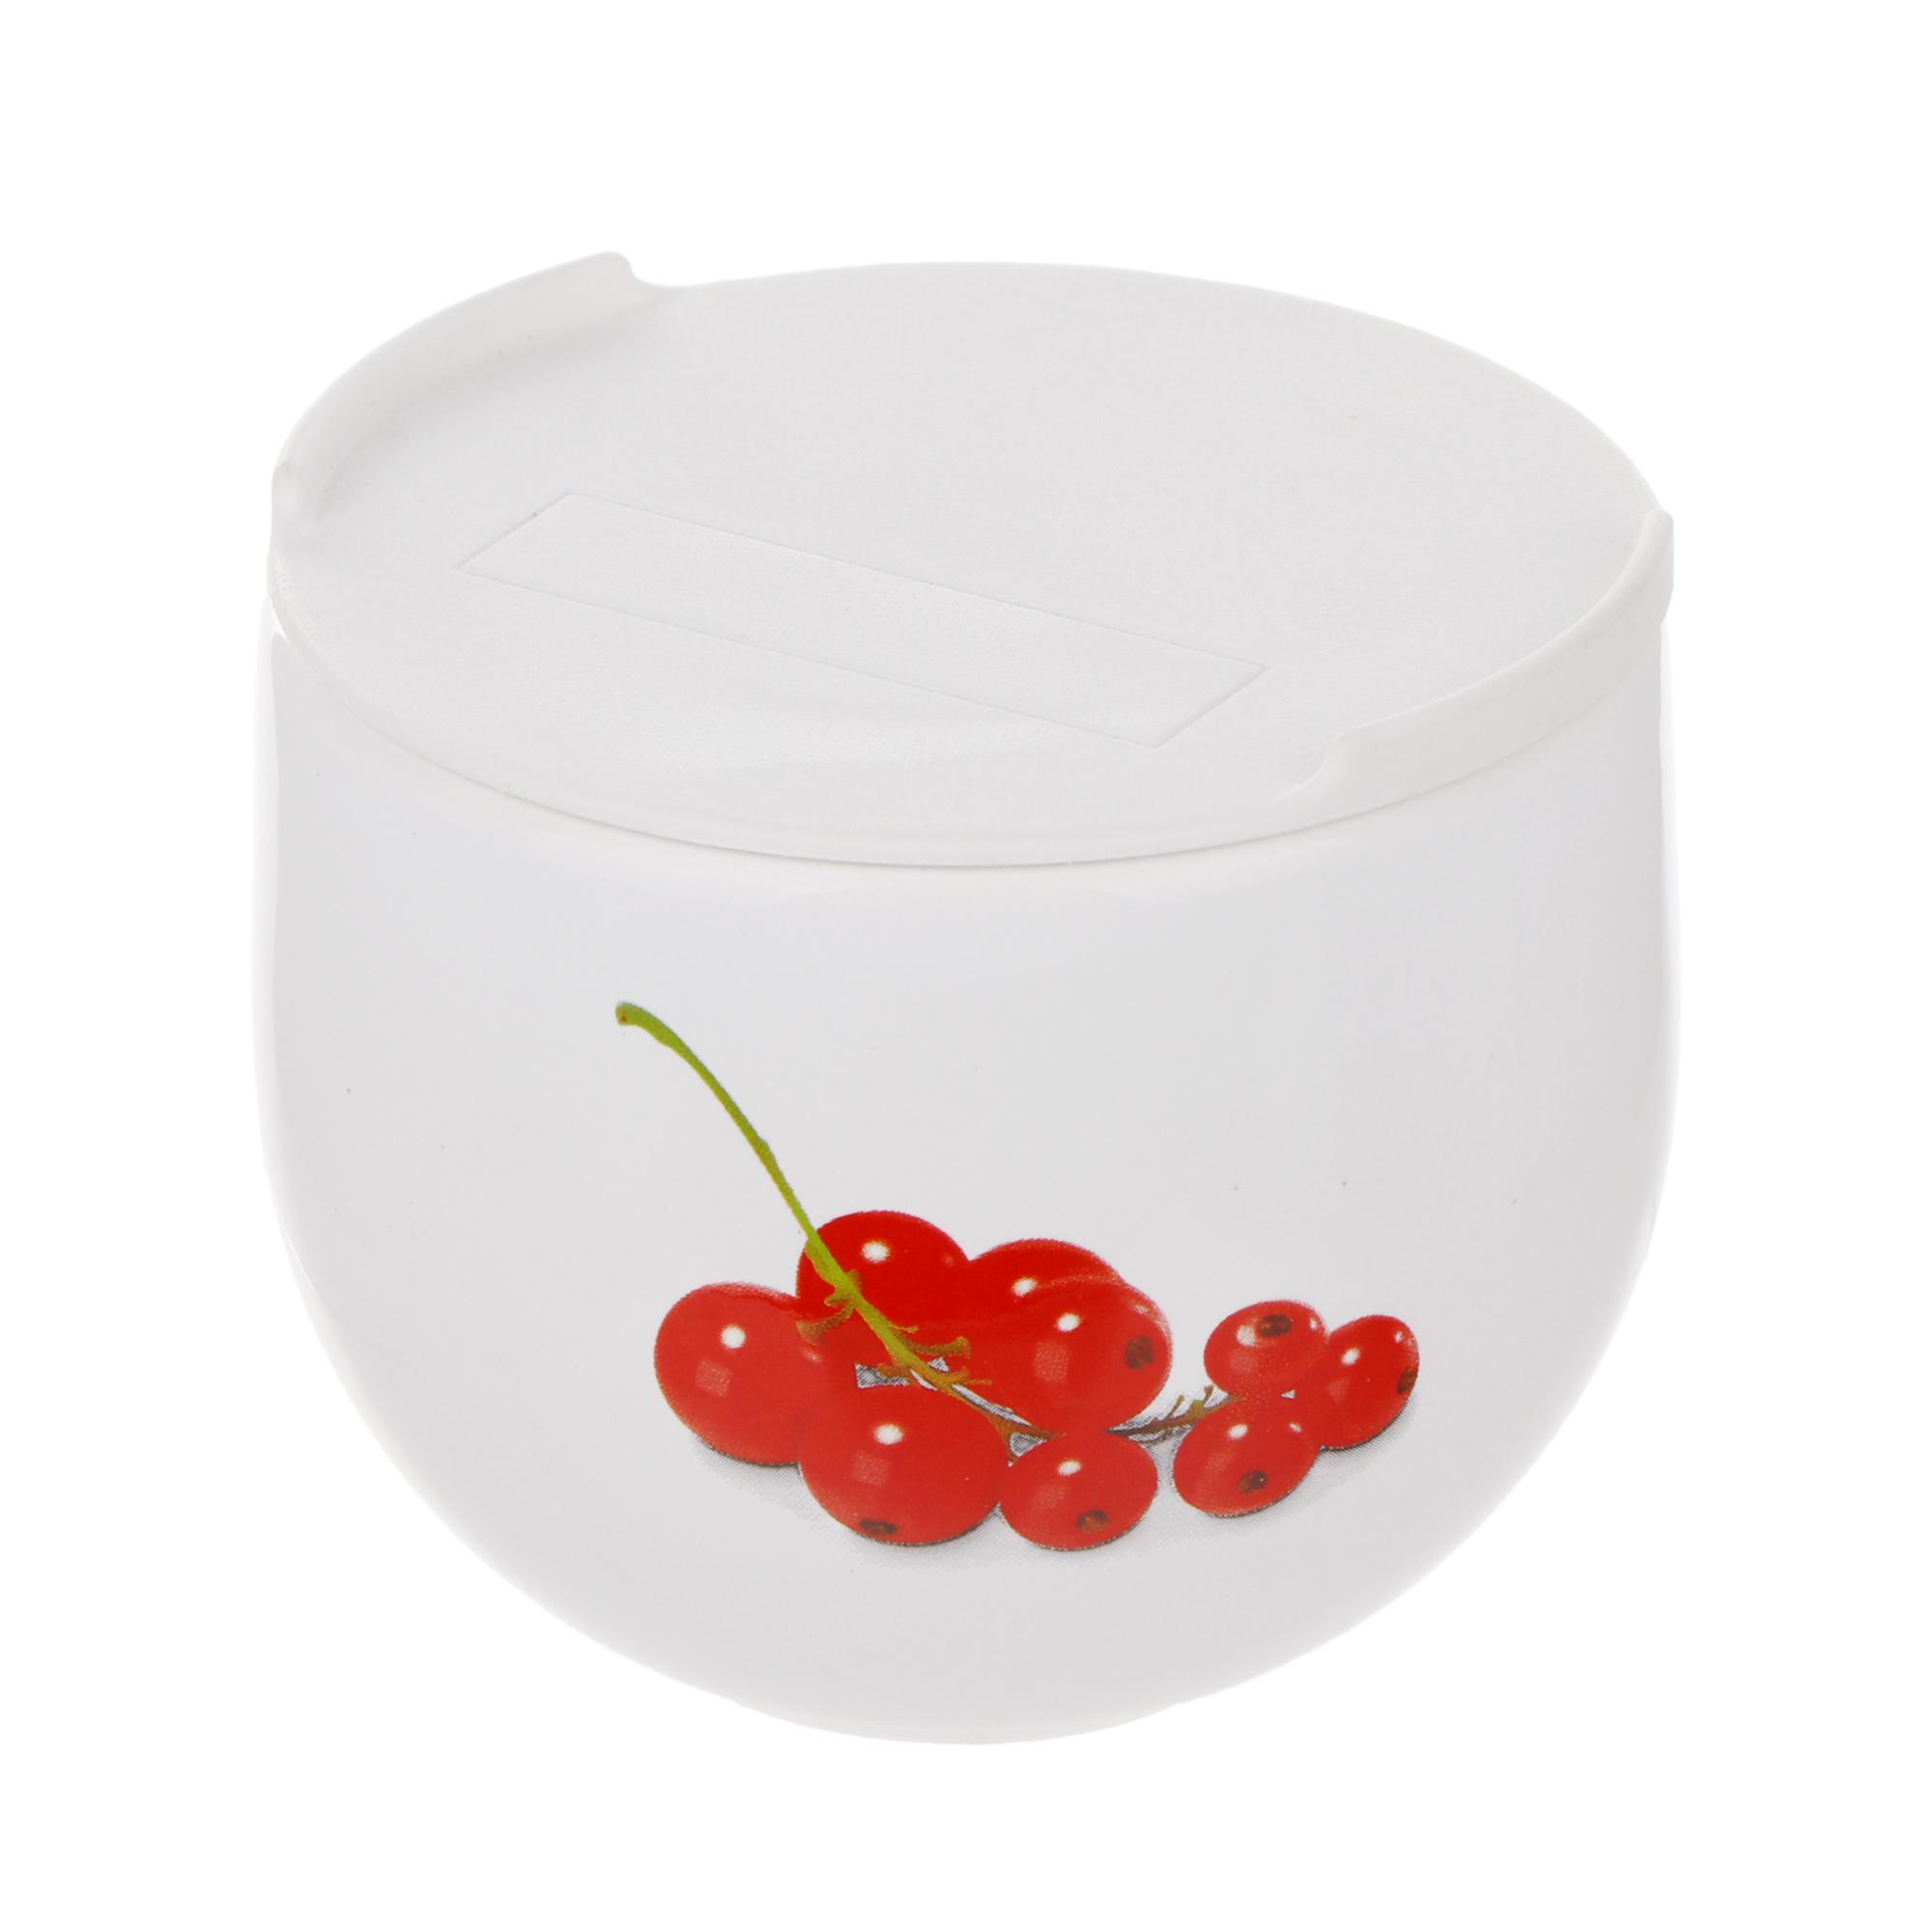 Фото - Банка Asa Selection Grande Смородина 9,5х8 см банка asa selection grande томаты 9 5х8 см